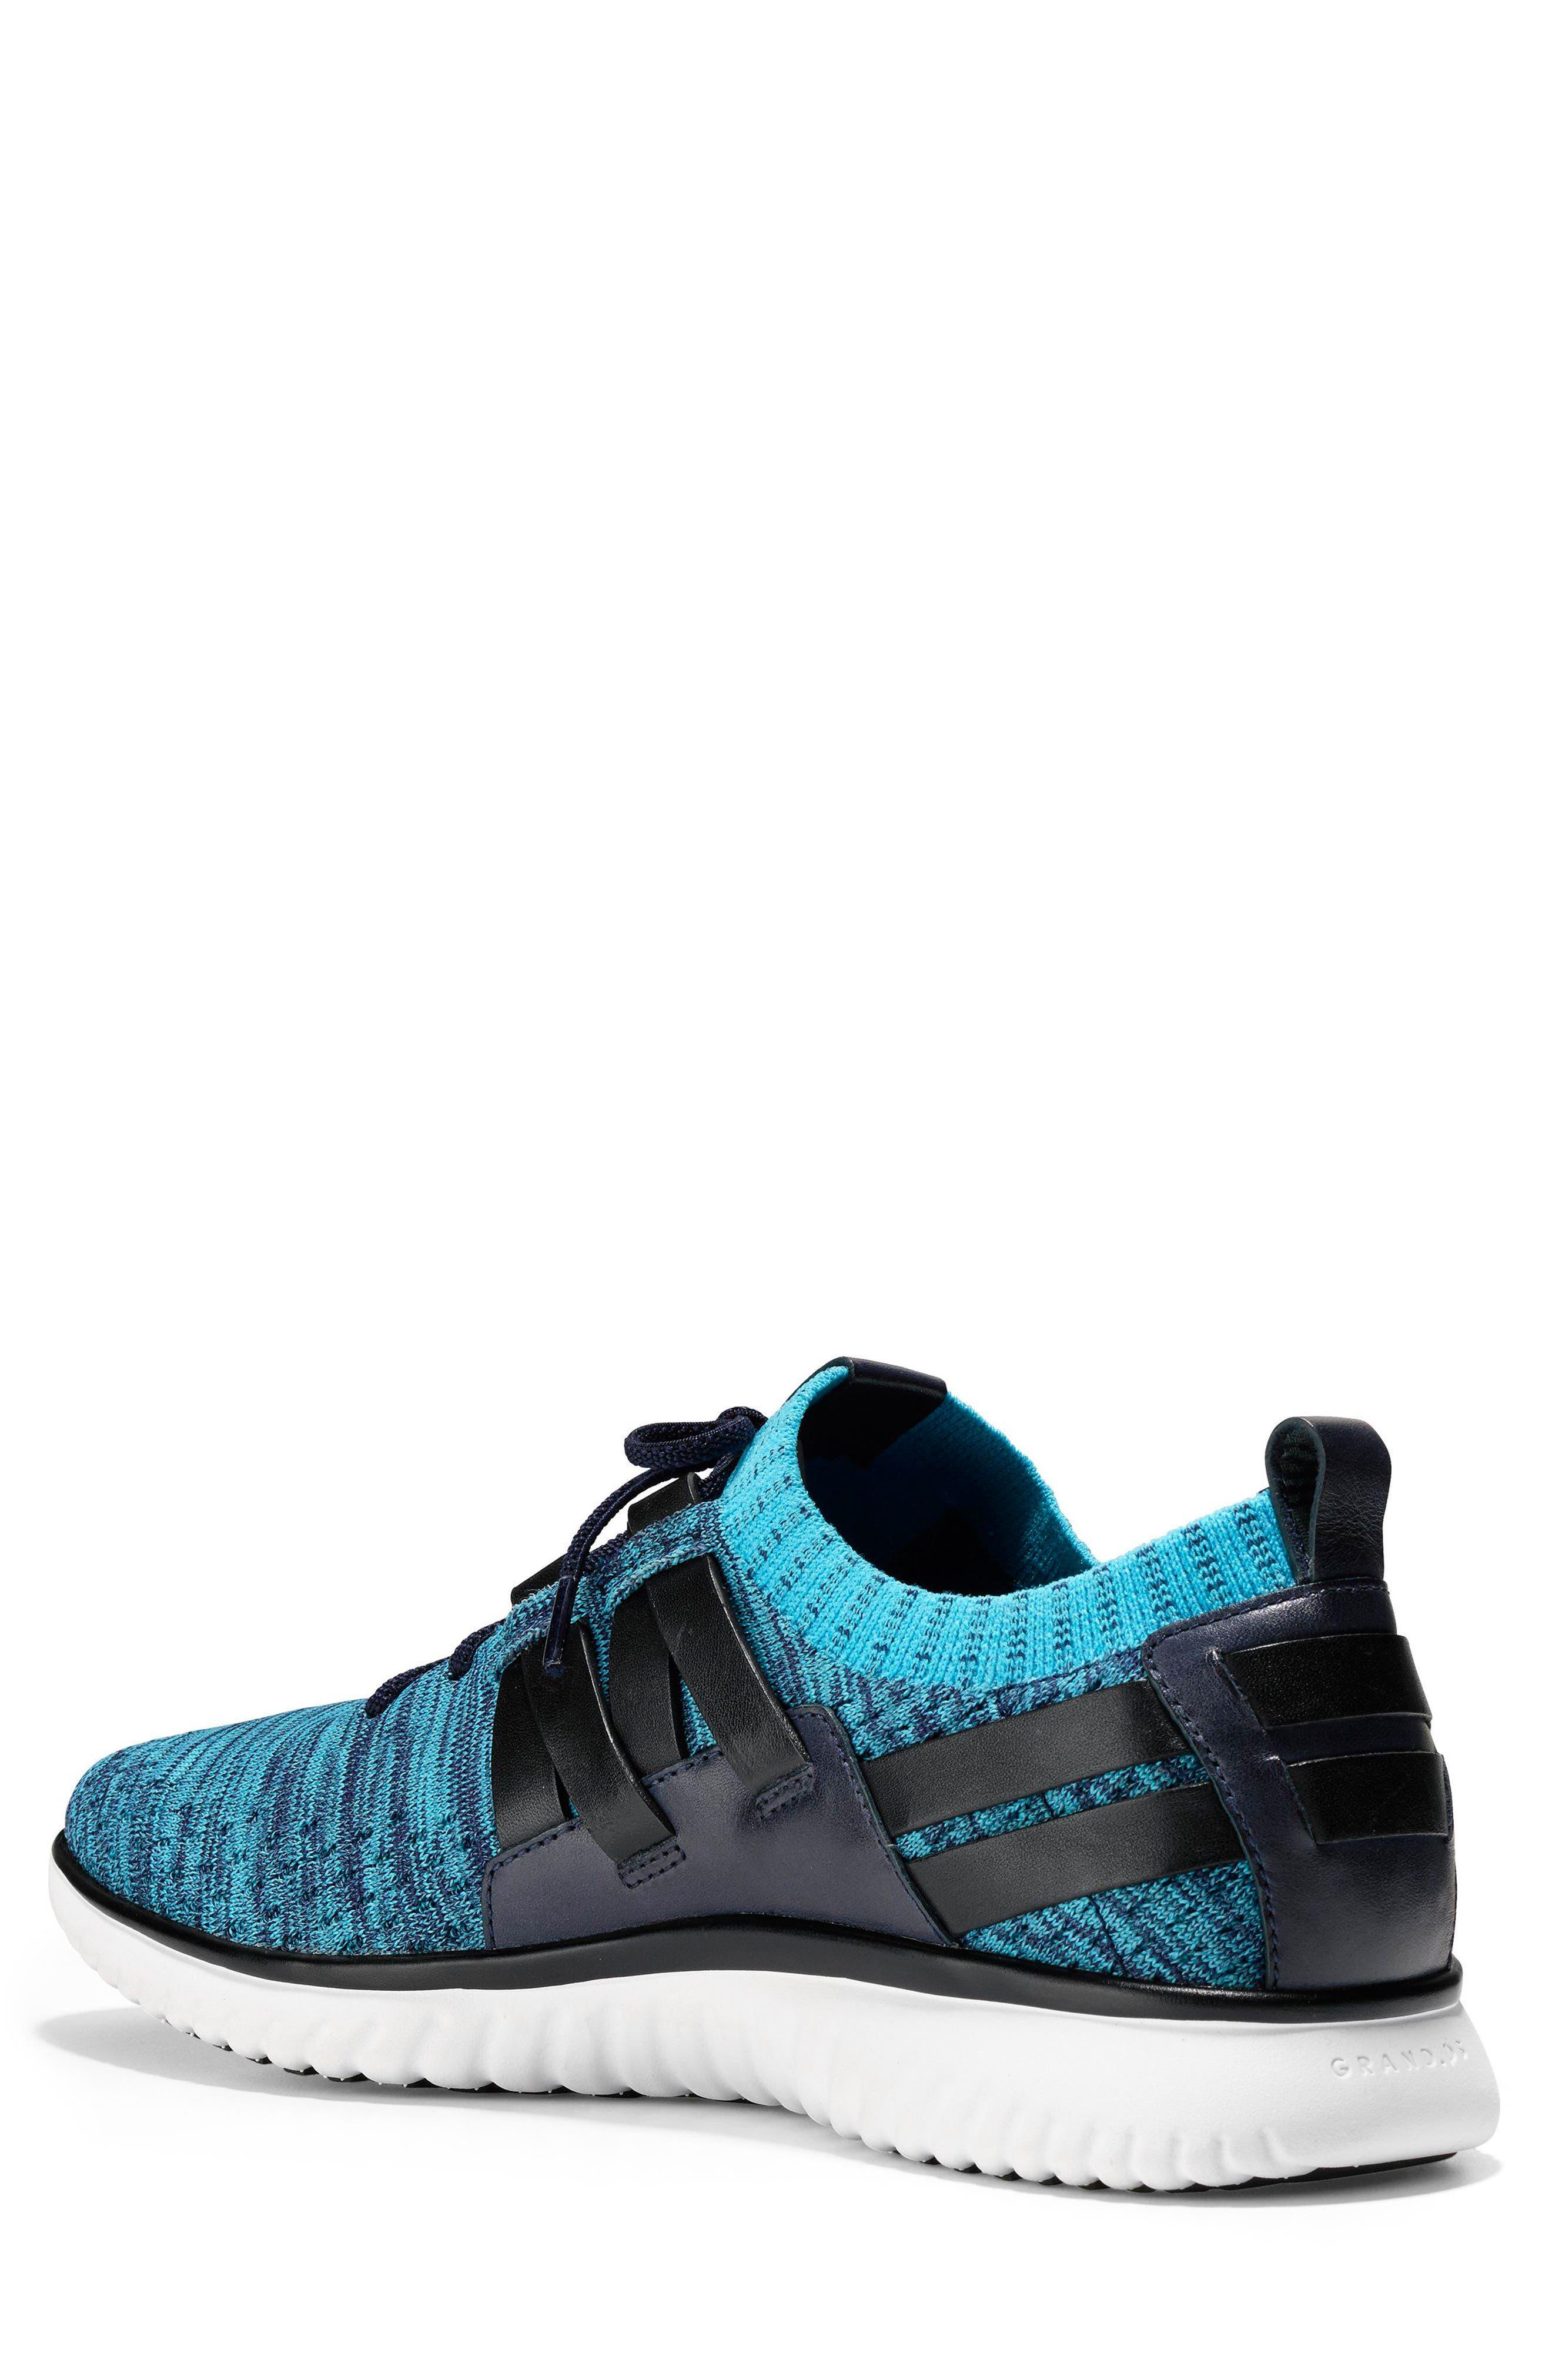 GrandMøtion Stitchlite<sup>™</sup> Woven Sneaker,                             Alternate thumbnail 2, color,                             Marine Blue